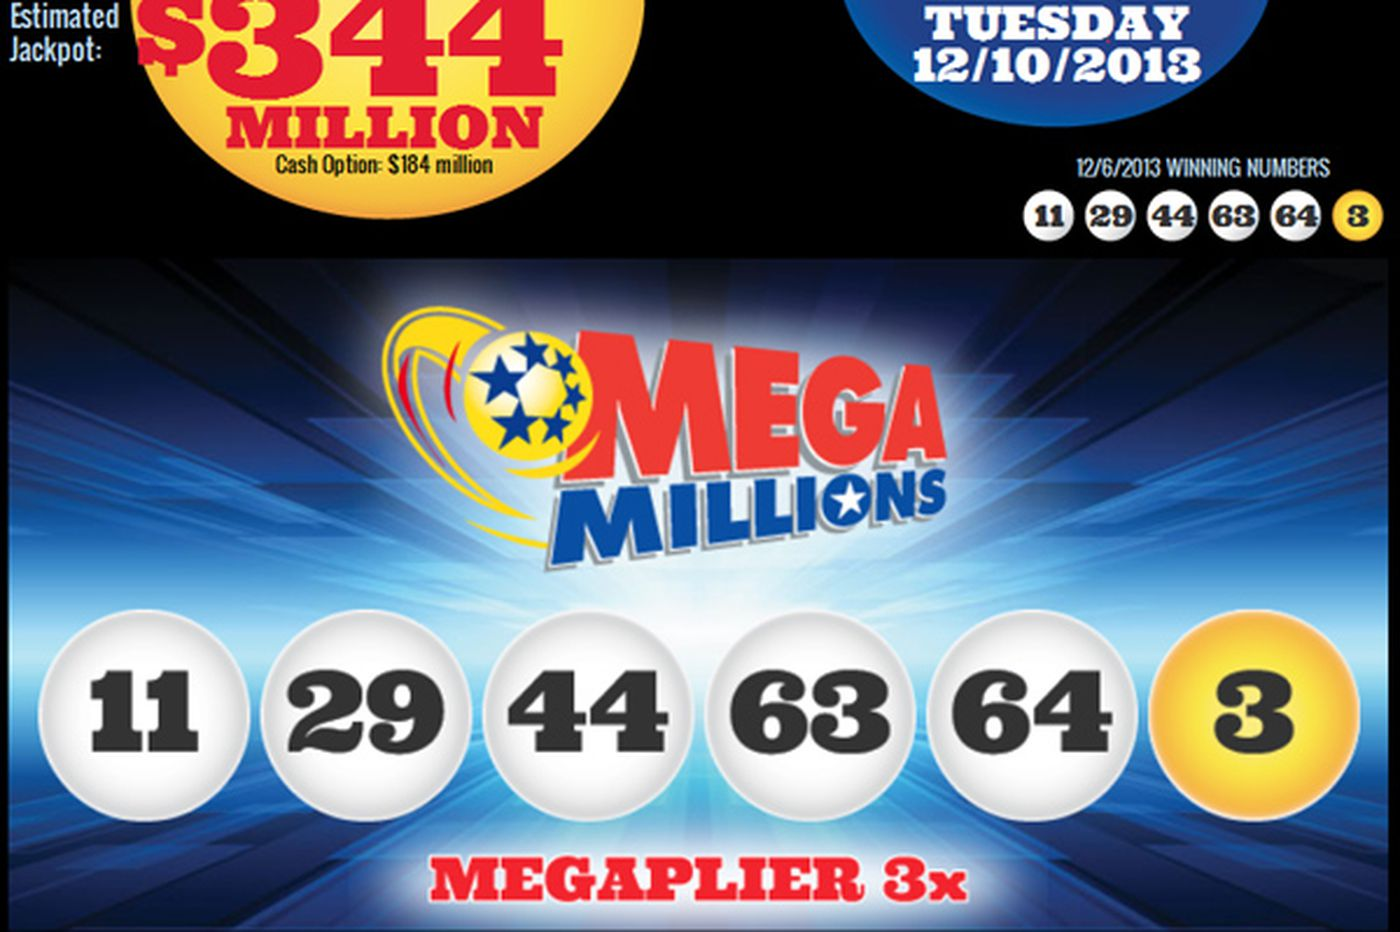 Mega Millions jackpot: Chance for new record?